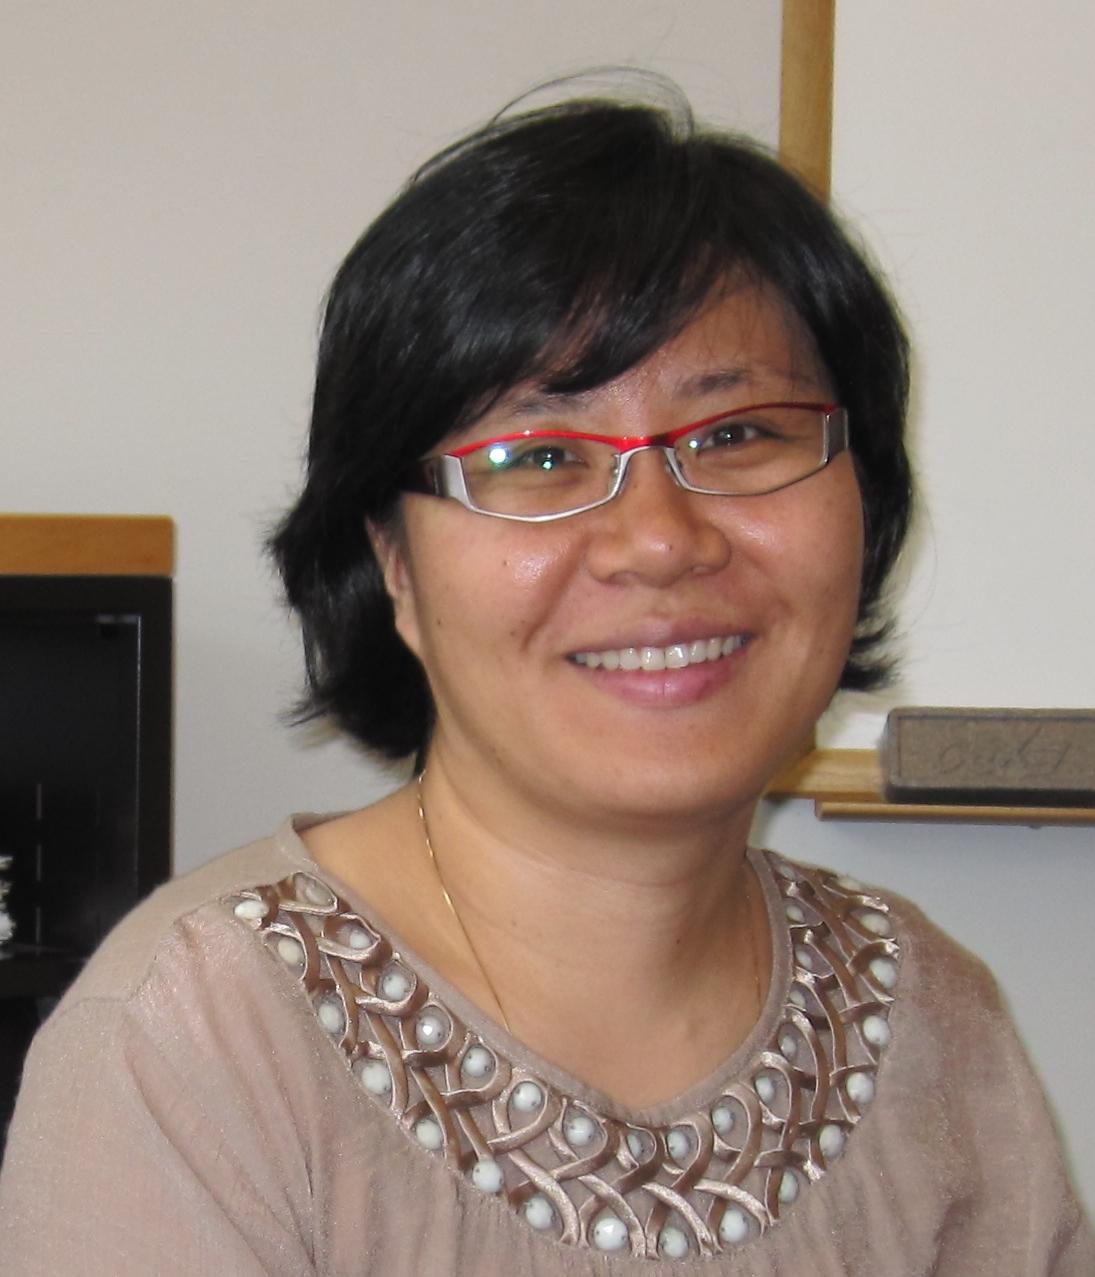 Mi Hee Lim. Image credit: Mi Hee Lim